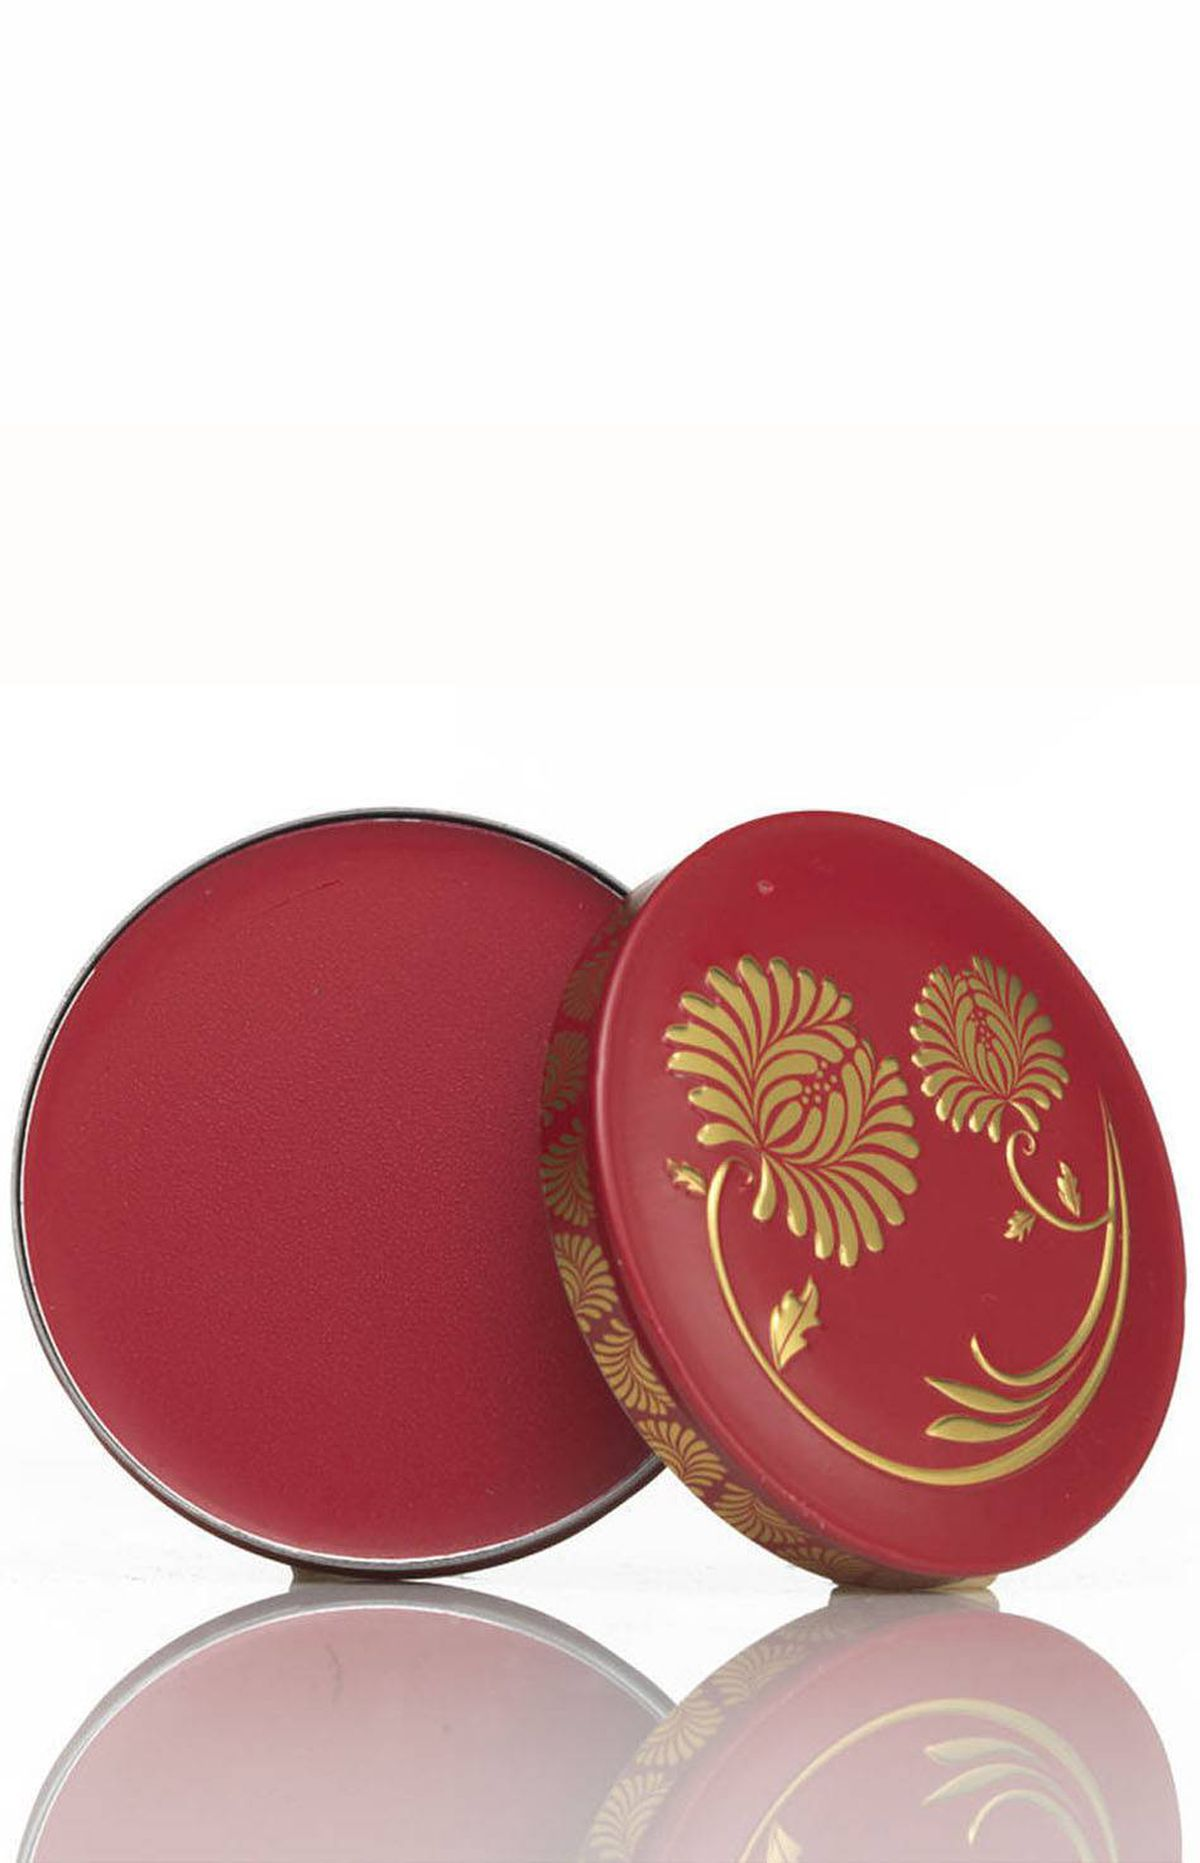 Crimson Cream Rouge by Besame, $22 through www.besamecosmetics.com